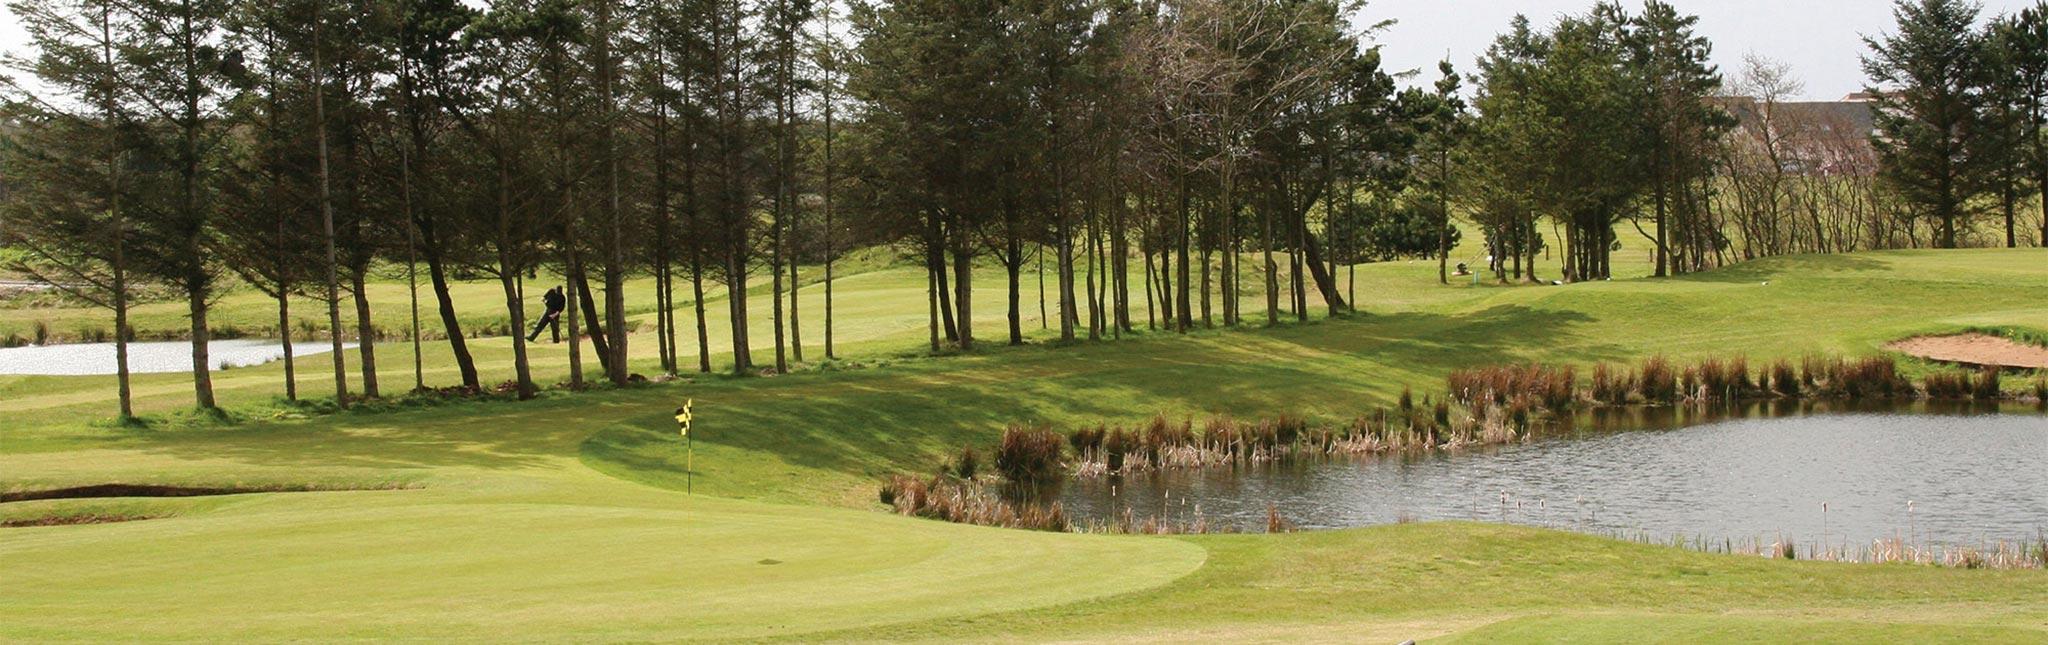 golf_course2048x645.jpg